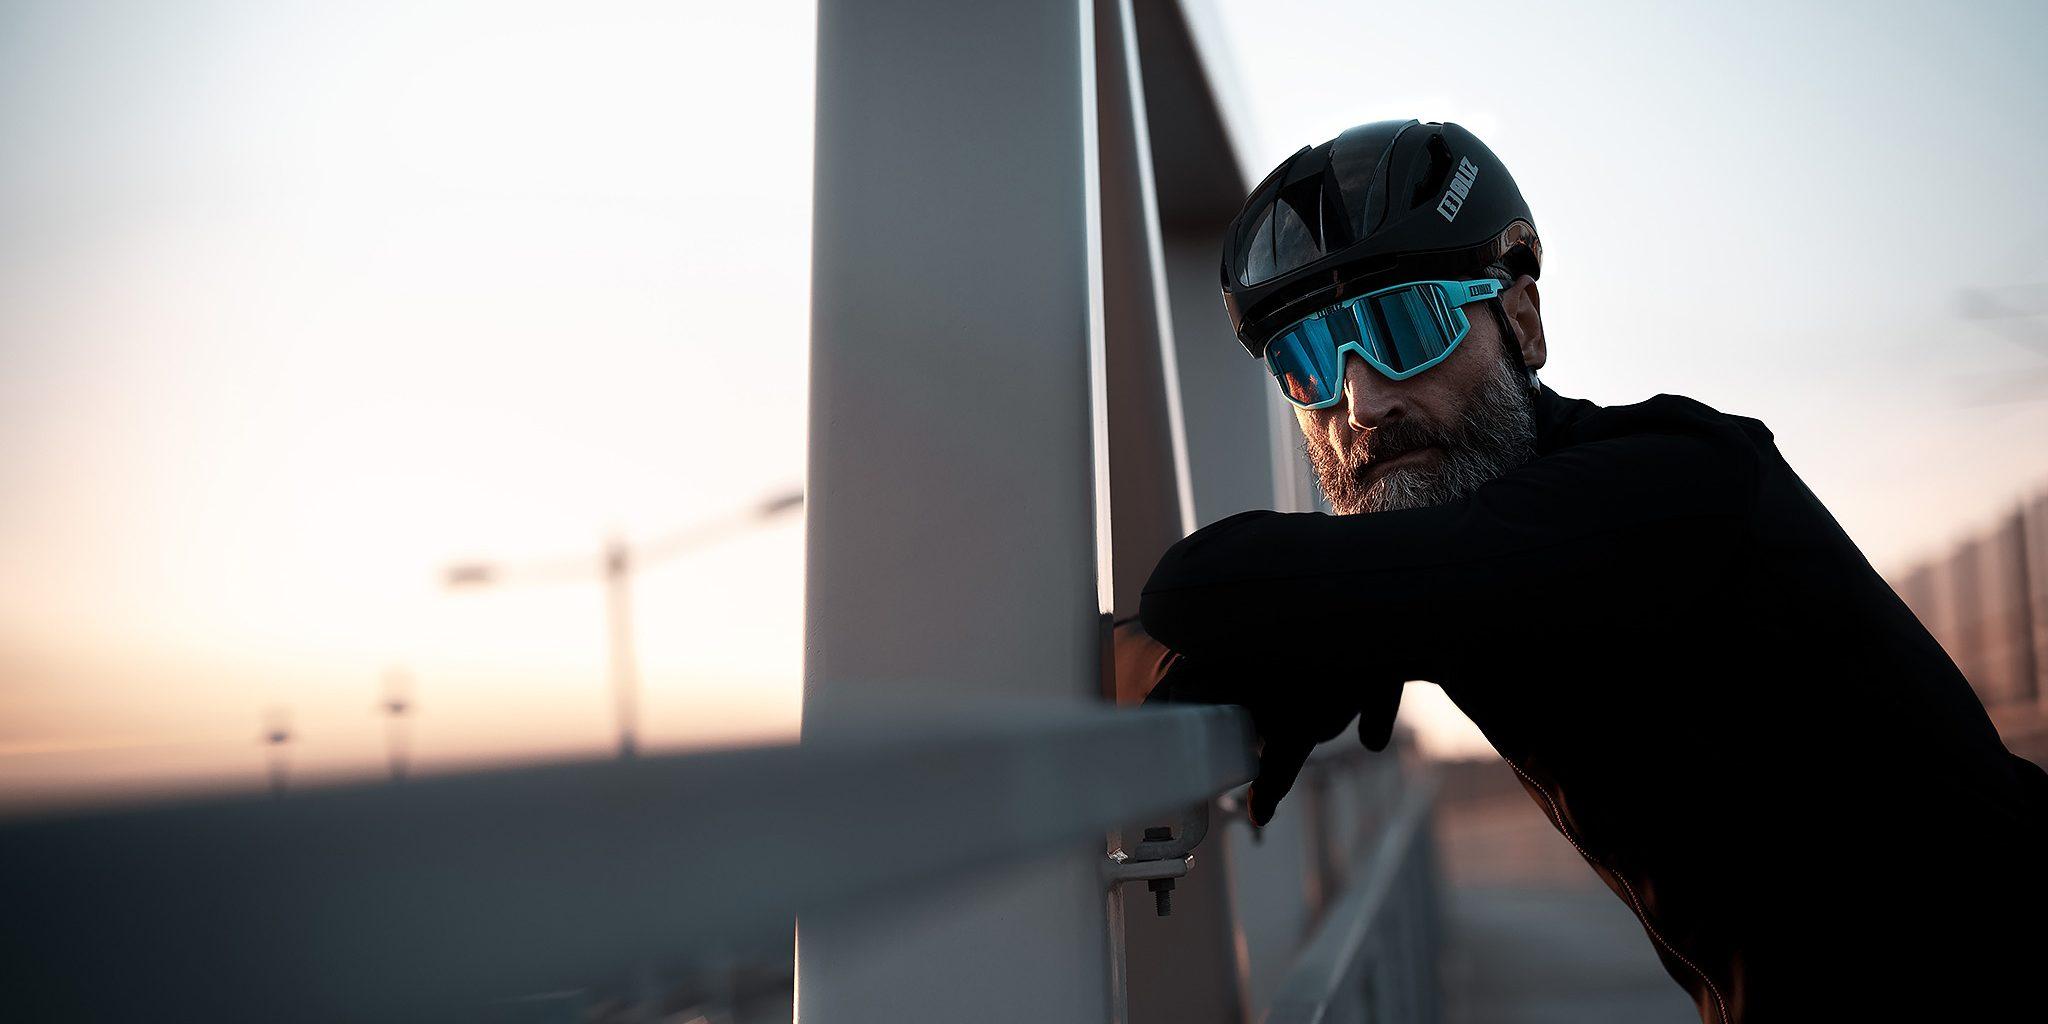 52105-34n_fusion-56007-10_zonar helmet-bliz_sunglasses_cycling_matt turquoise_sportsglasses_lifestyle5